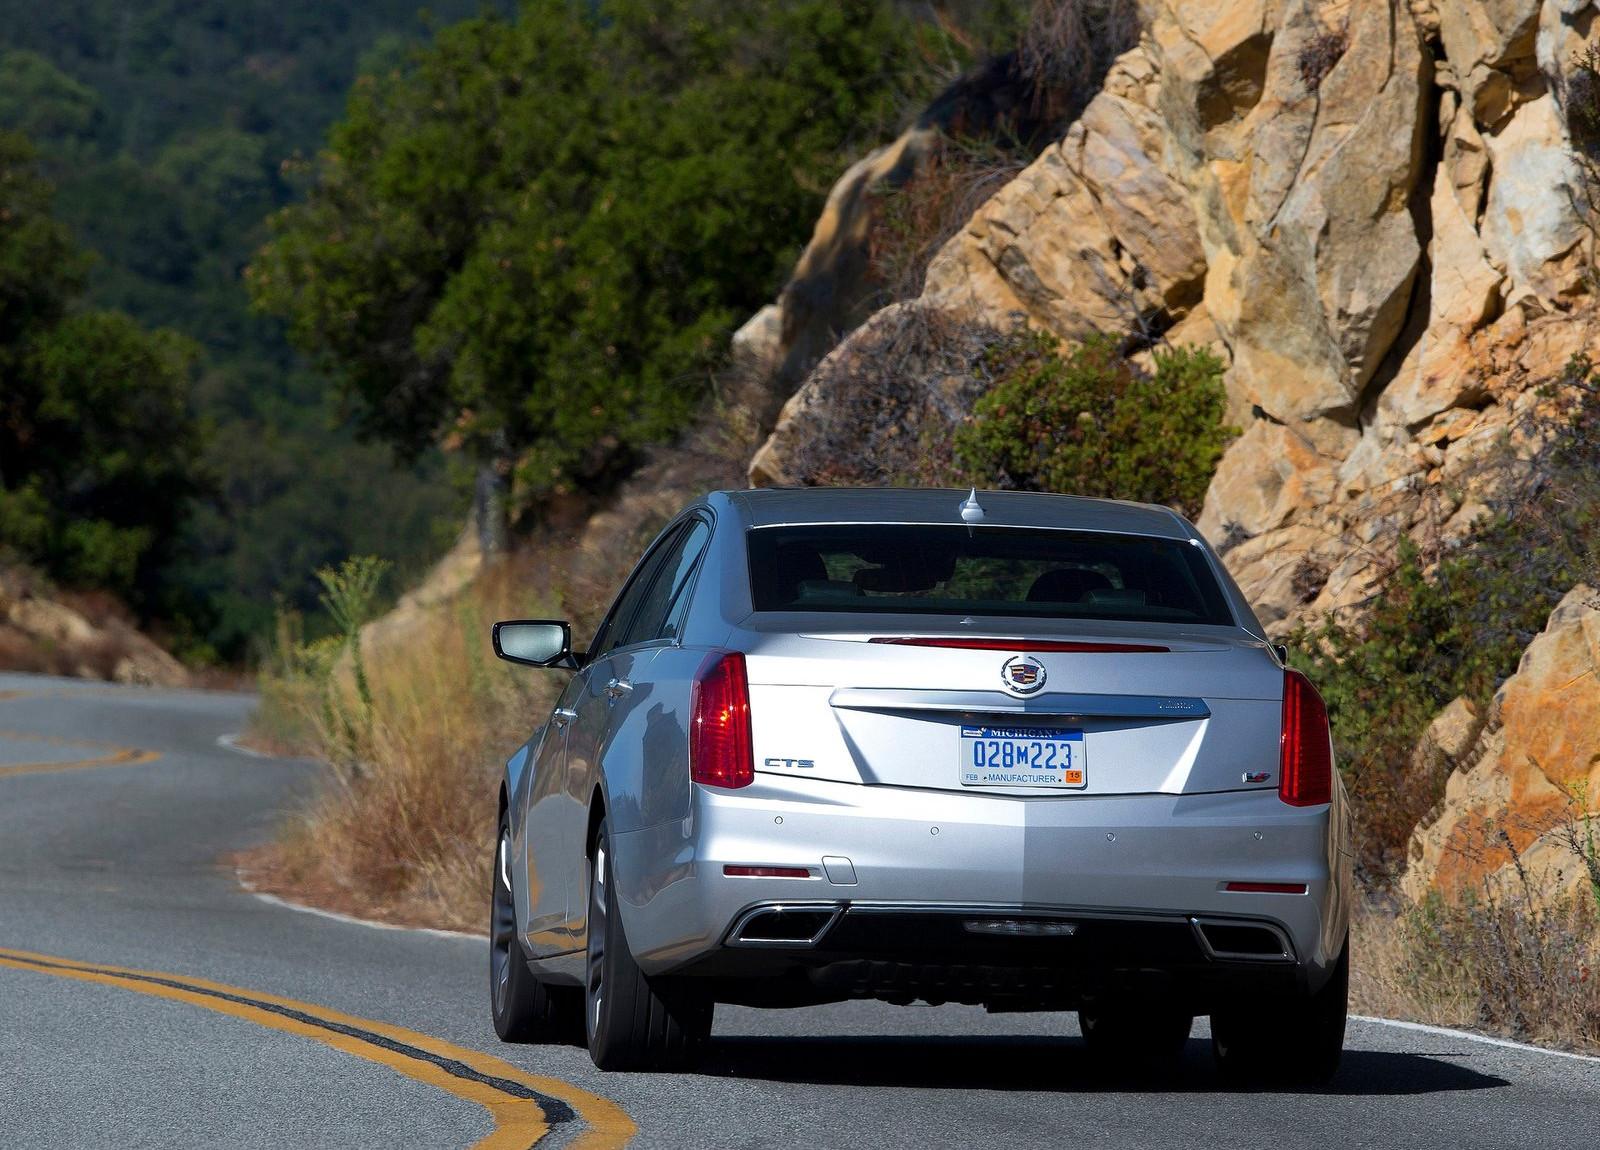 Cadillac-CTS_2014_1600x1200_wallpaper_3a